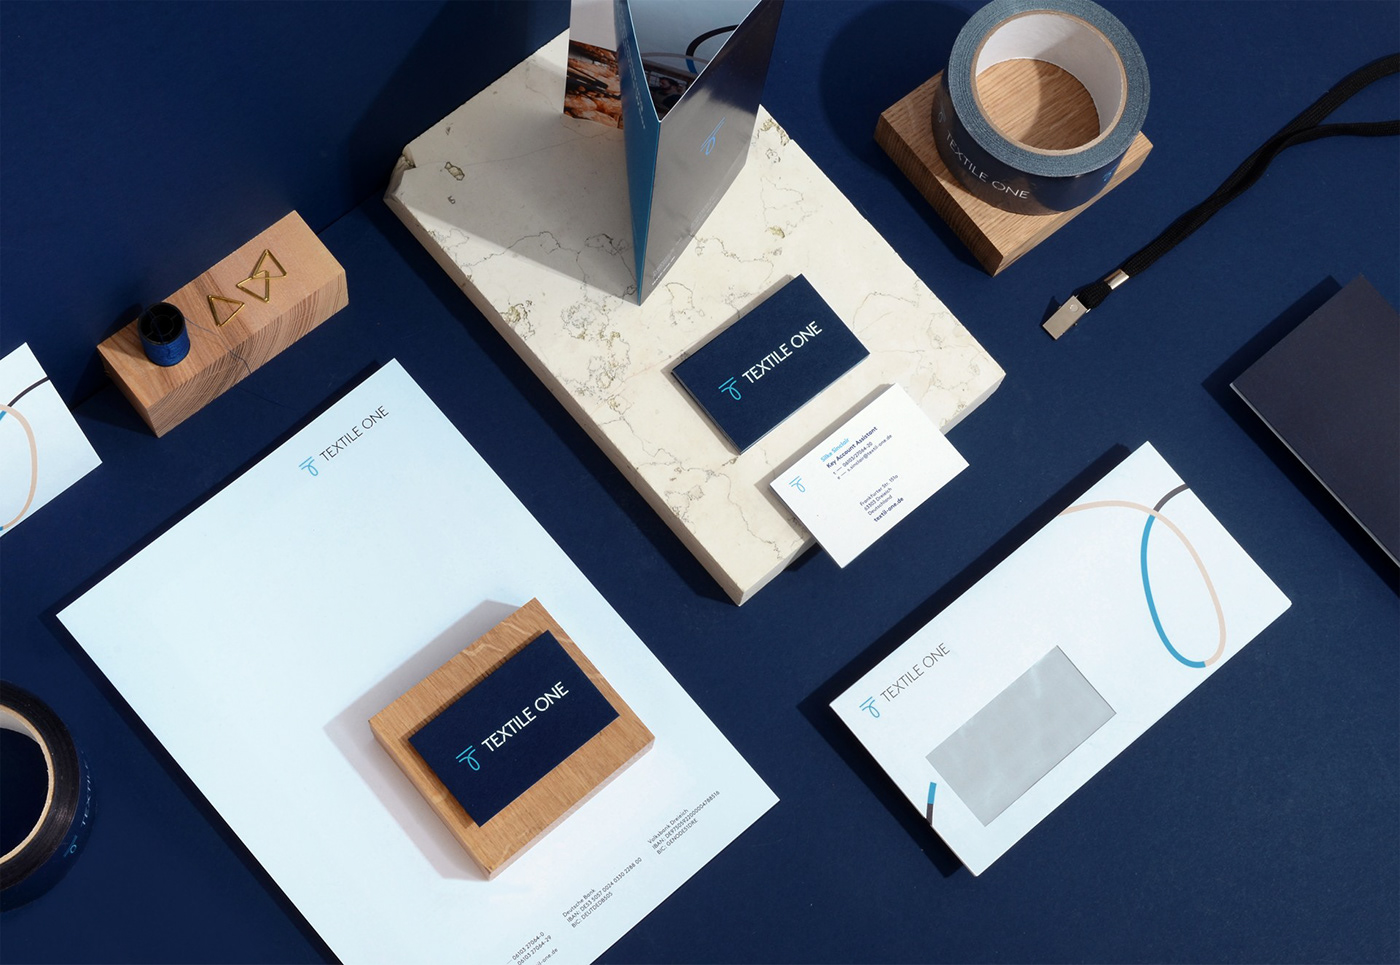 #stilllife branddesign BrandIllustration iconography rebranding #Corporate   #Identity #manual #startup #textile